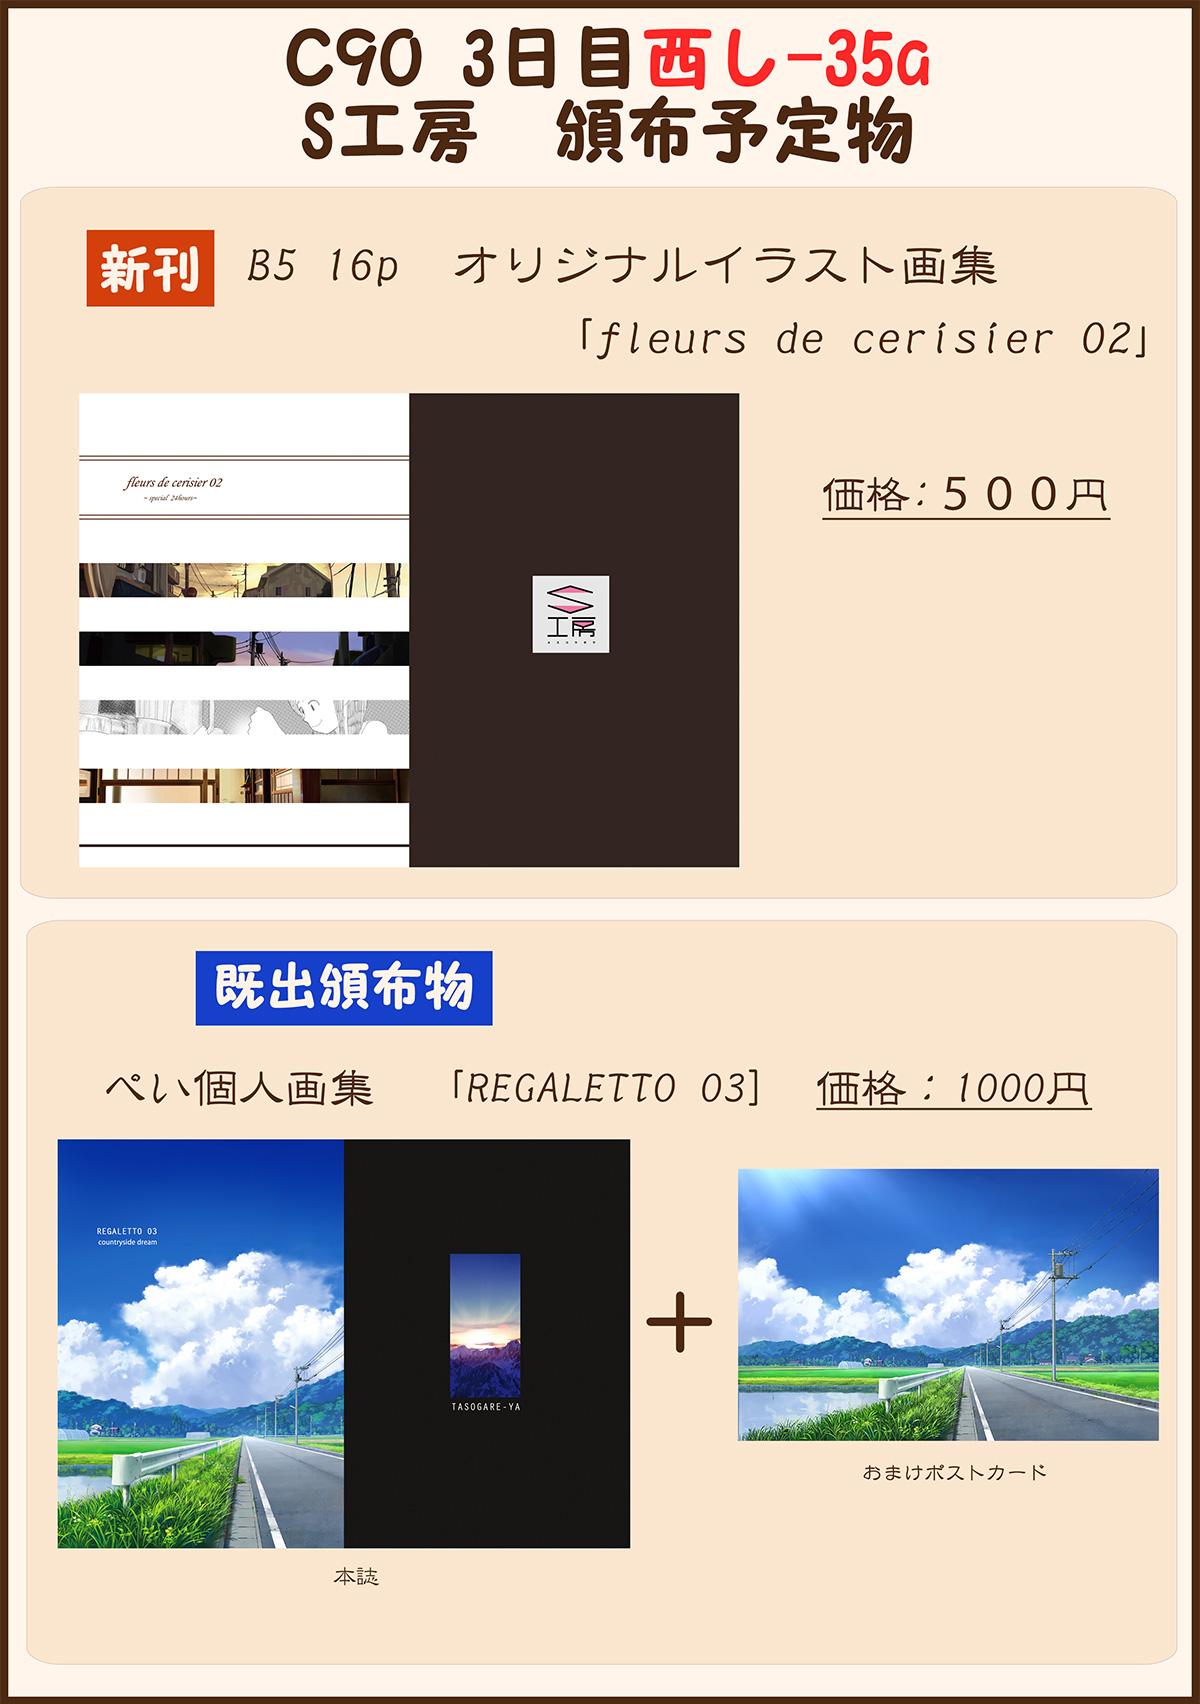 20160806002627c80.jpg